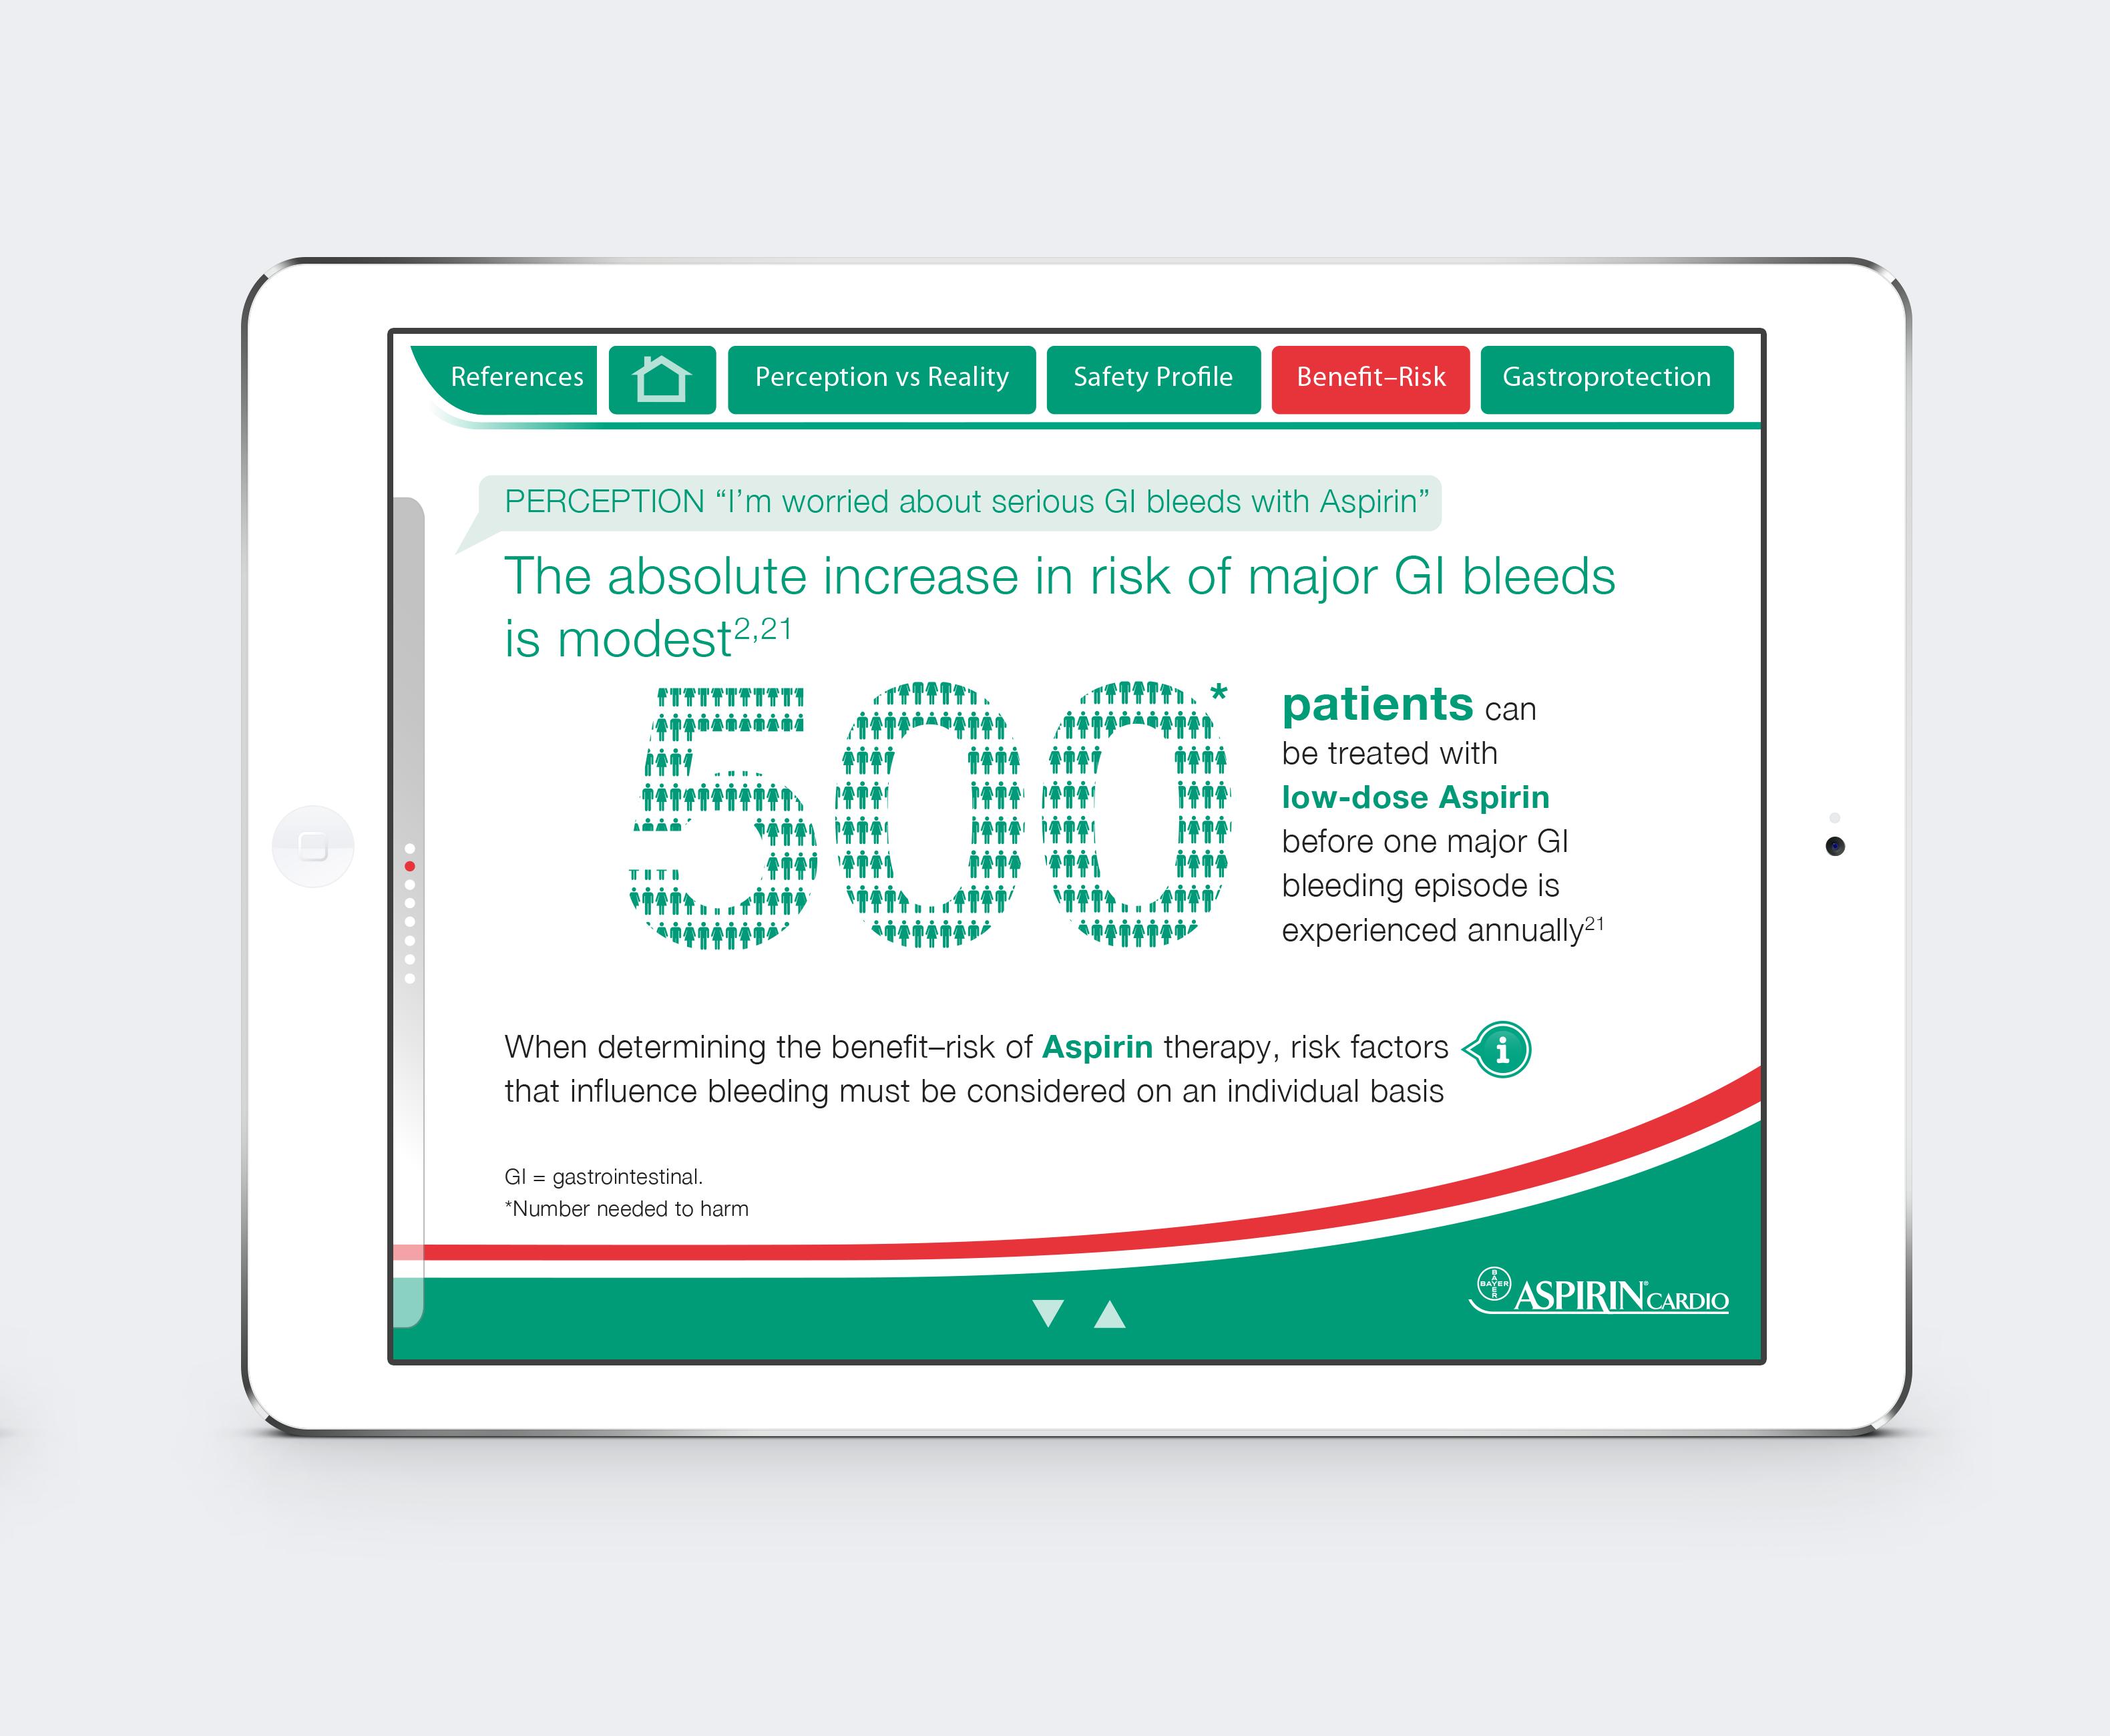 02-iPad-Air-Landscape-Mock-up_aspirin2